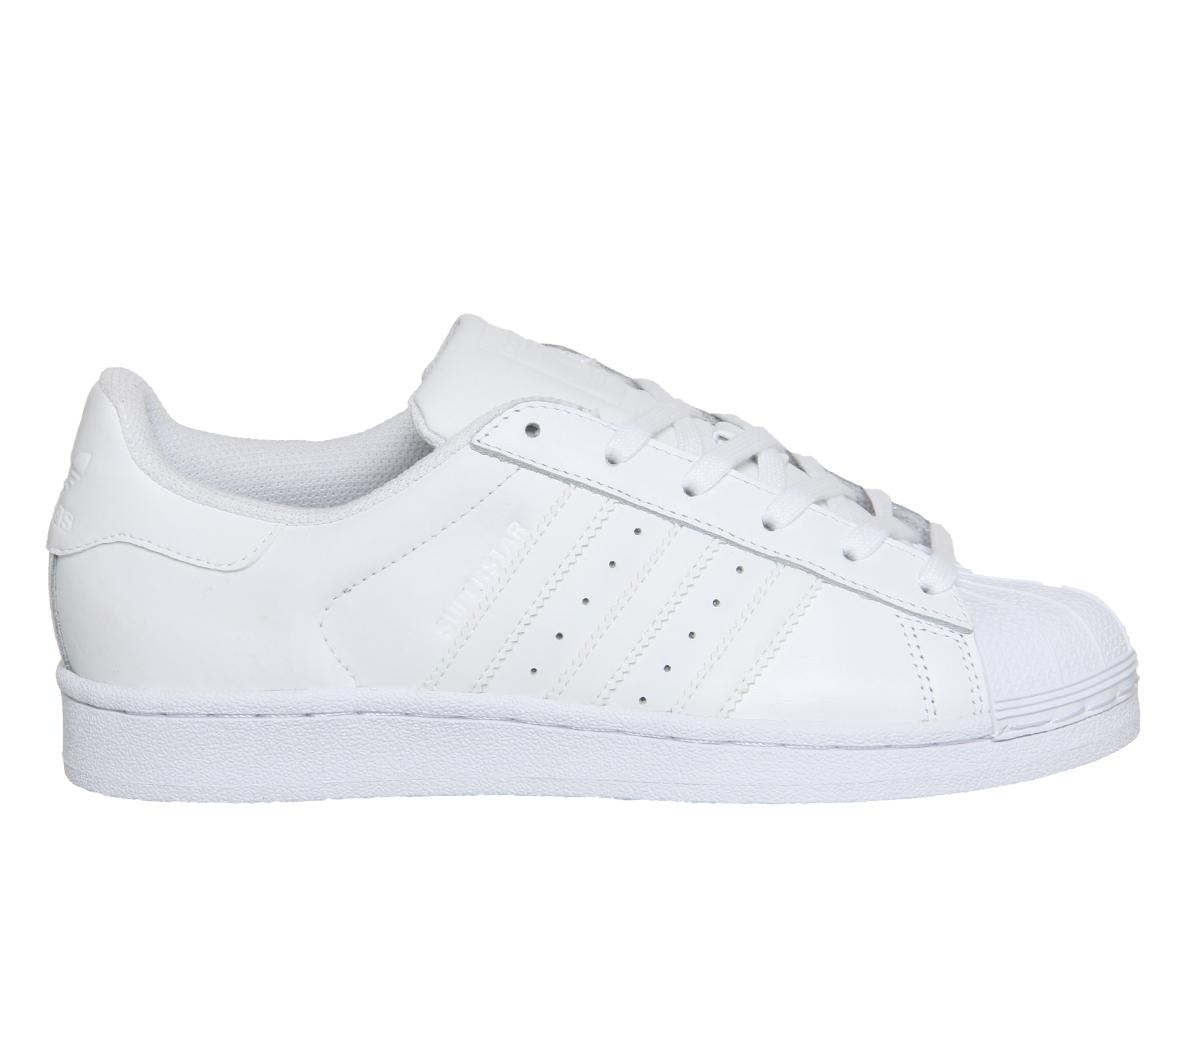 Short-Femme-Adidas-Superstar-Baskets-Blanc-Mono-Foundation-